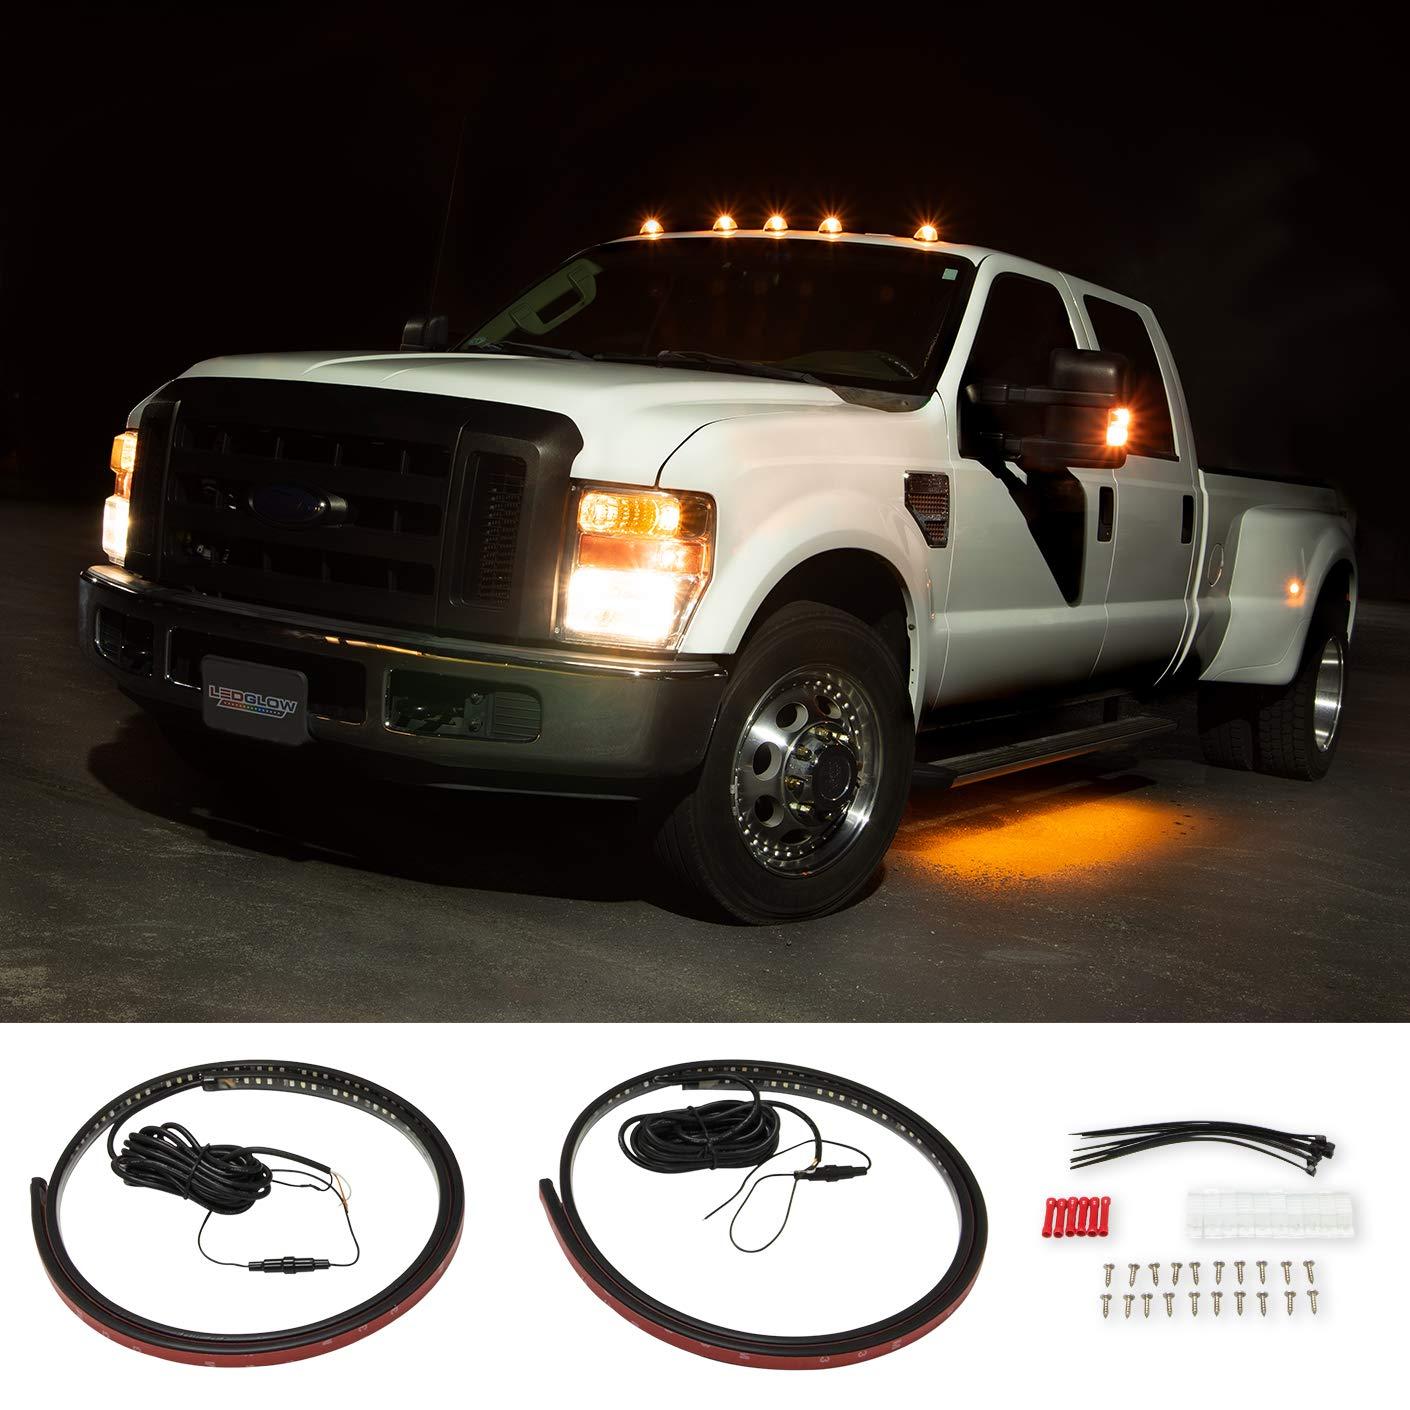 "LEDGlow 70"" Truck LED Running Board Light Amber Side Marker Kit with White Courtesy Lights for Extended & Crew Cab Trucks - Multi-Function Lighting - Flexible Waterproof Strips"